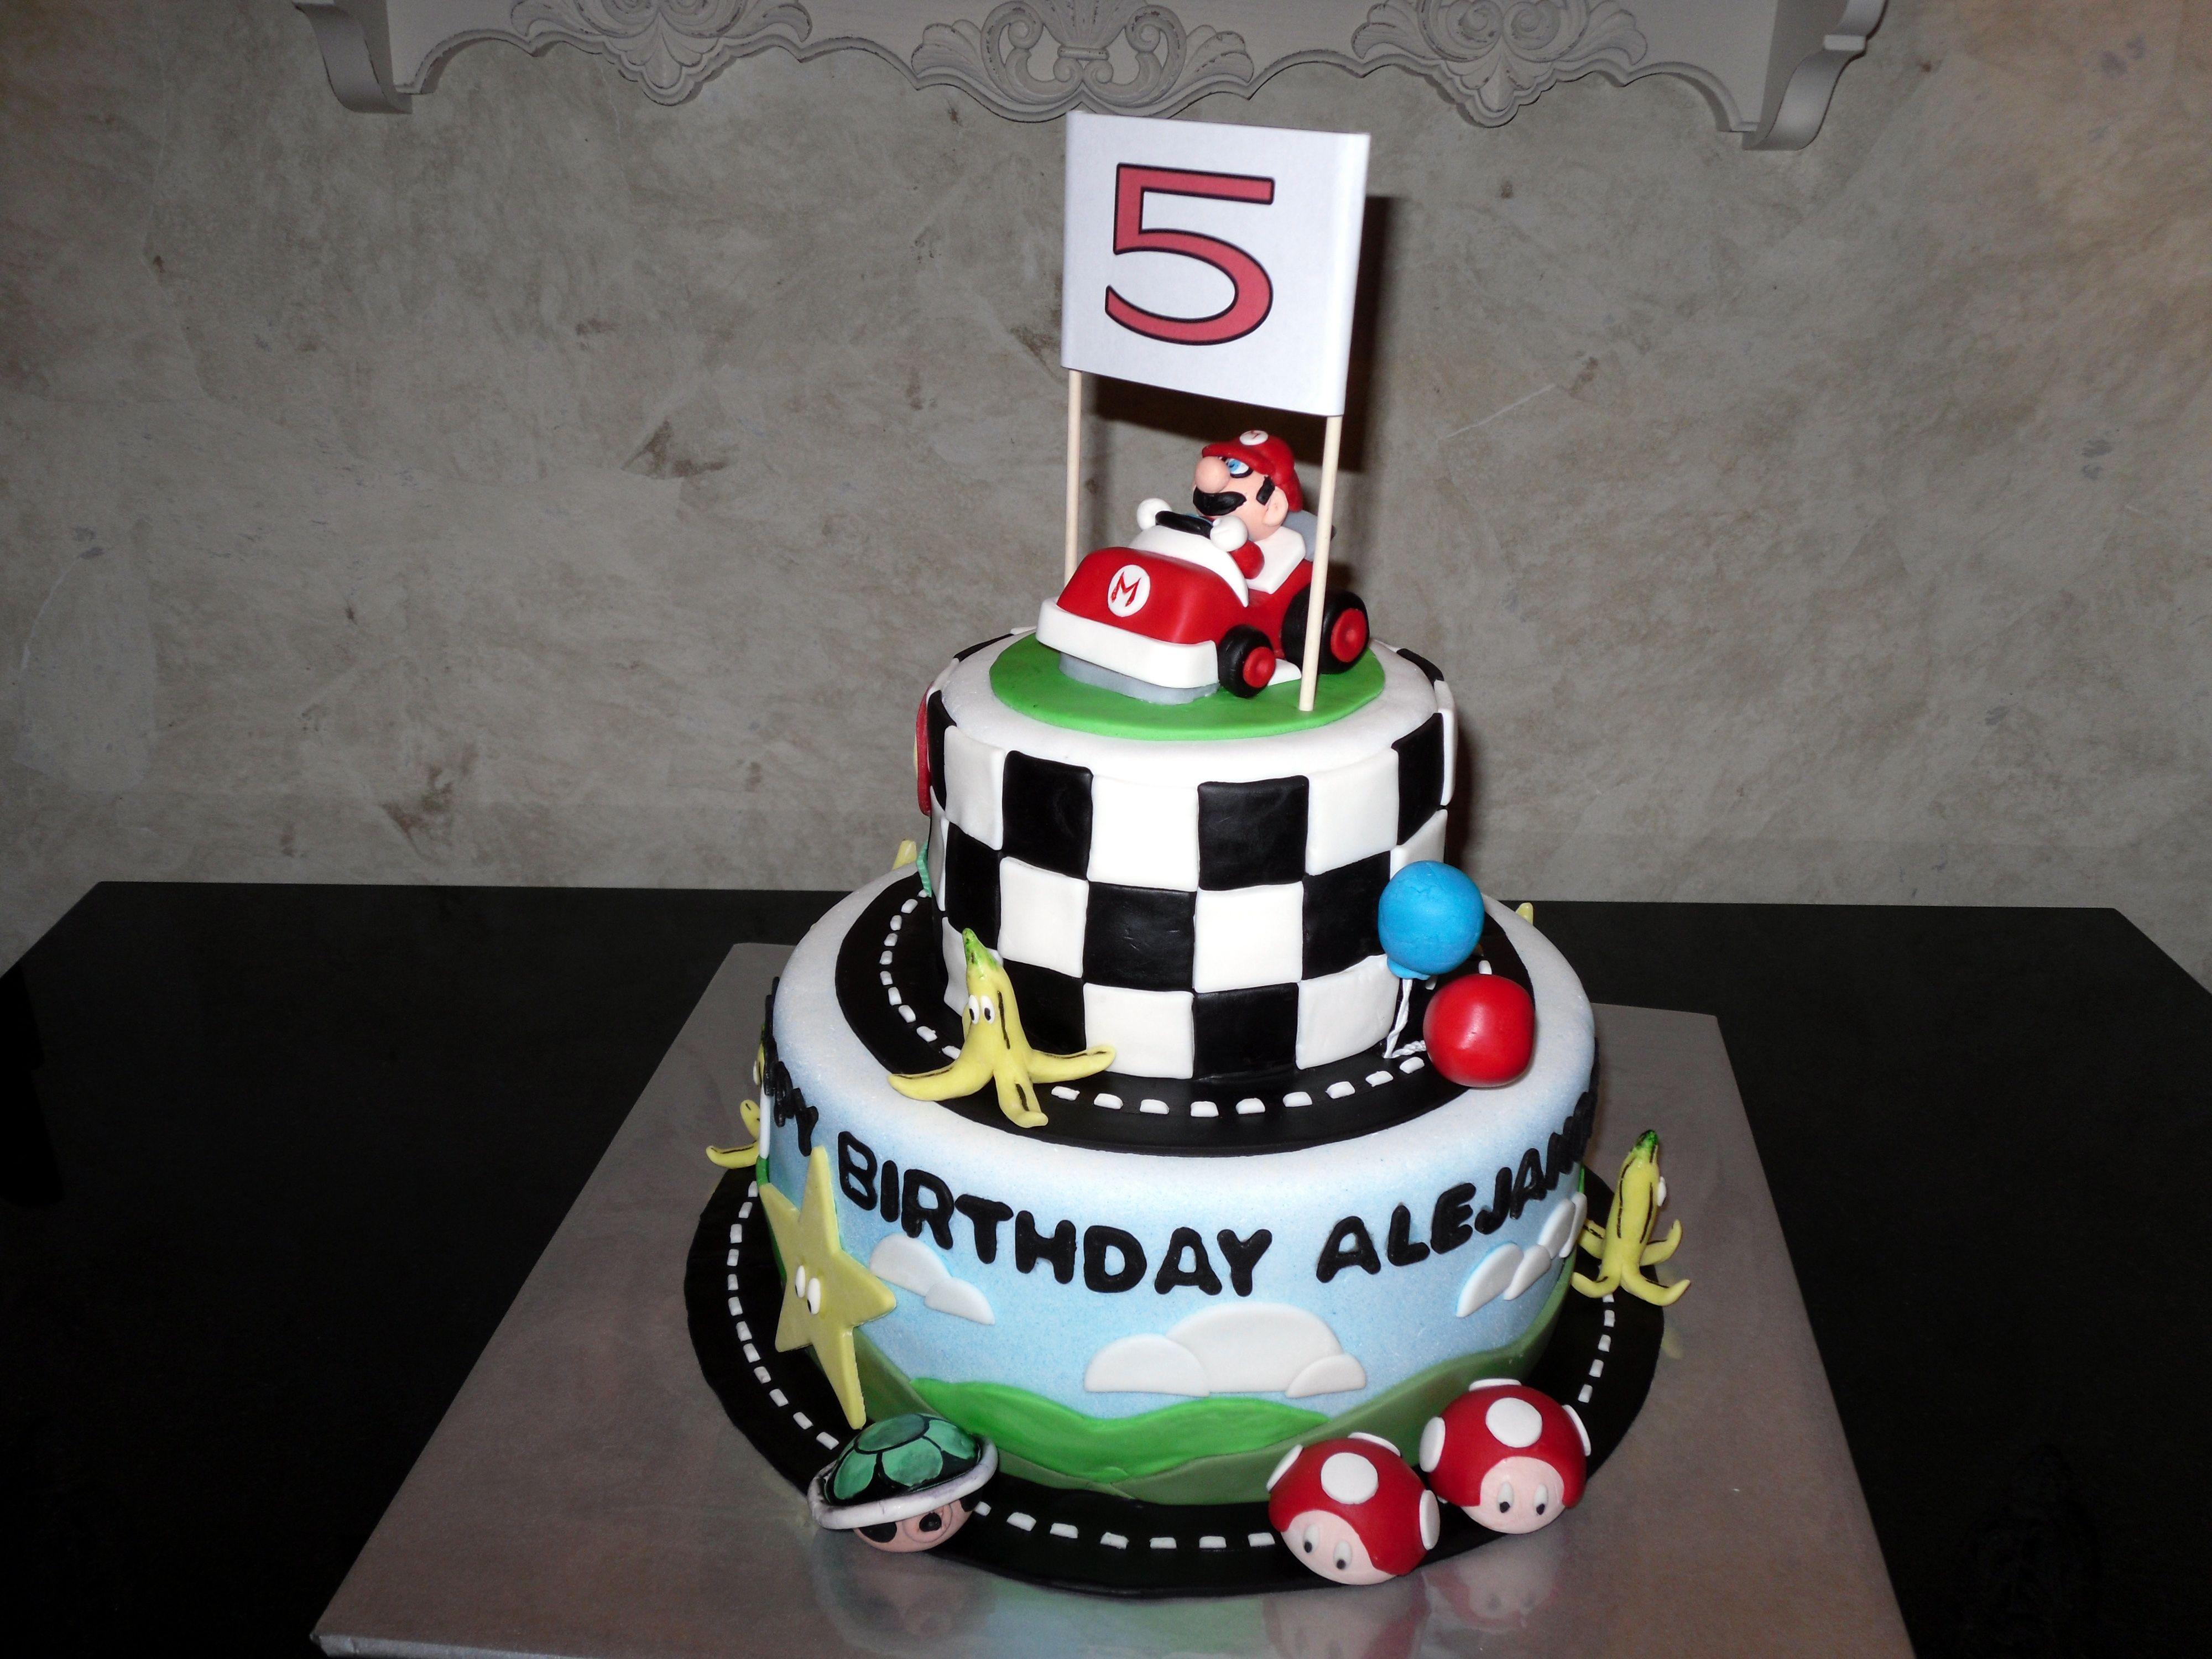 Mario Kart Birthday Cake Birthdays Pinterest Mario kart